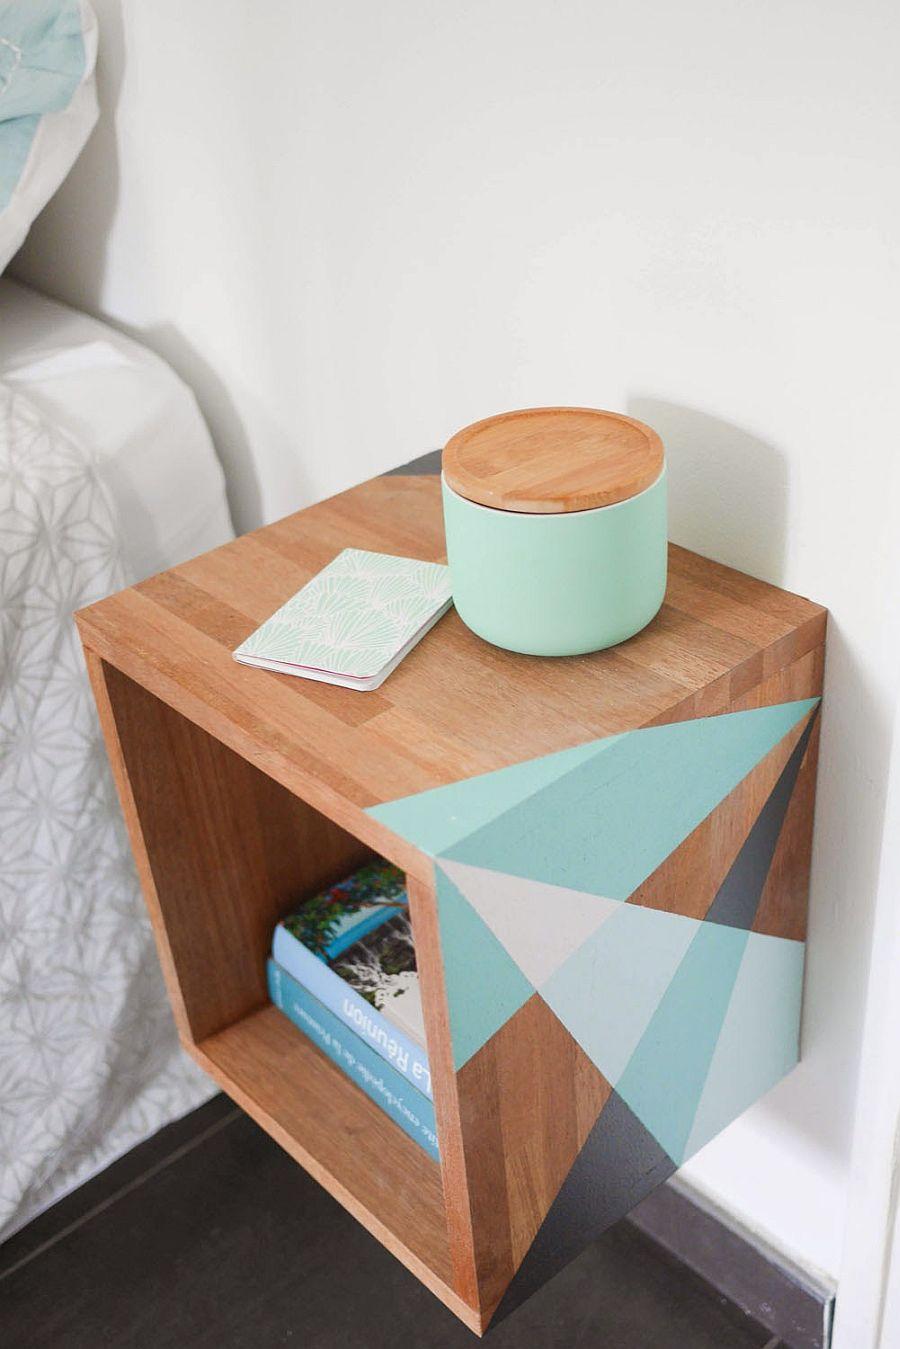 Space-savvy-bedside-DIY-nightstand-idea